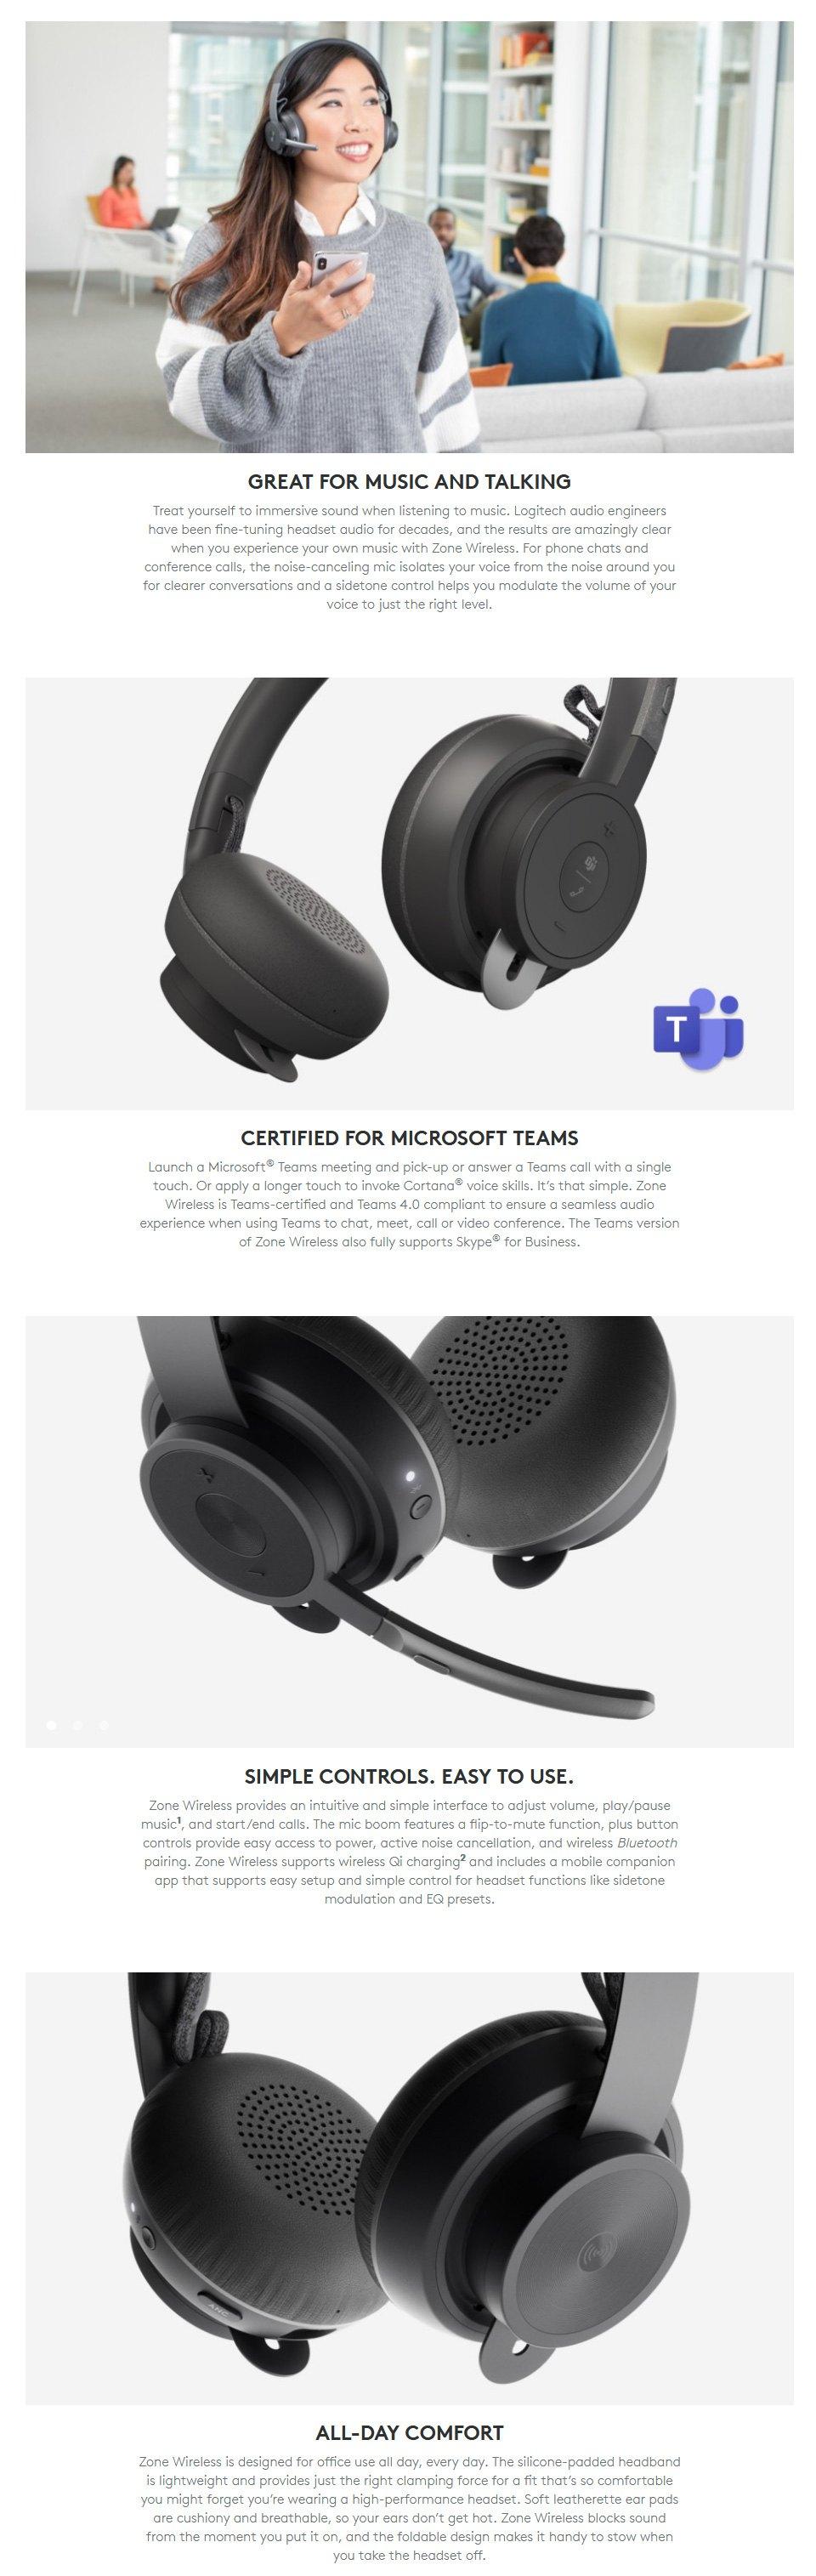 Logitech Zone Wireless Bluetooth Headset features 2